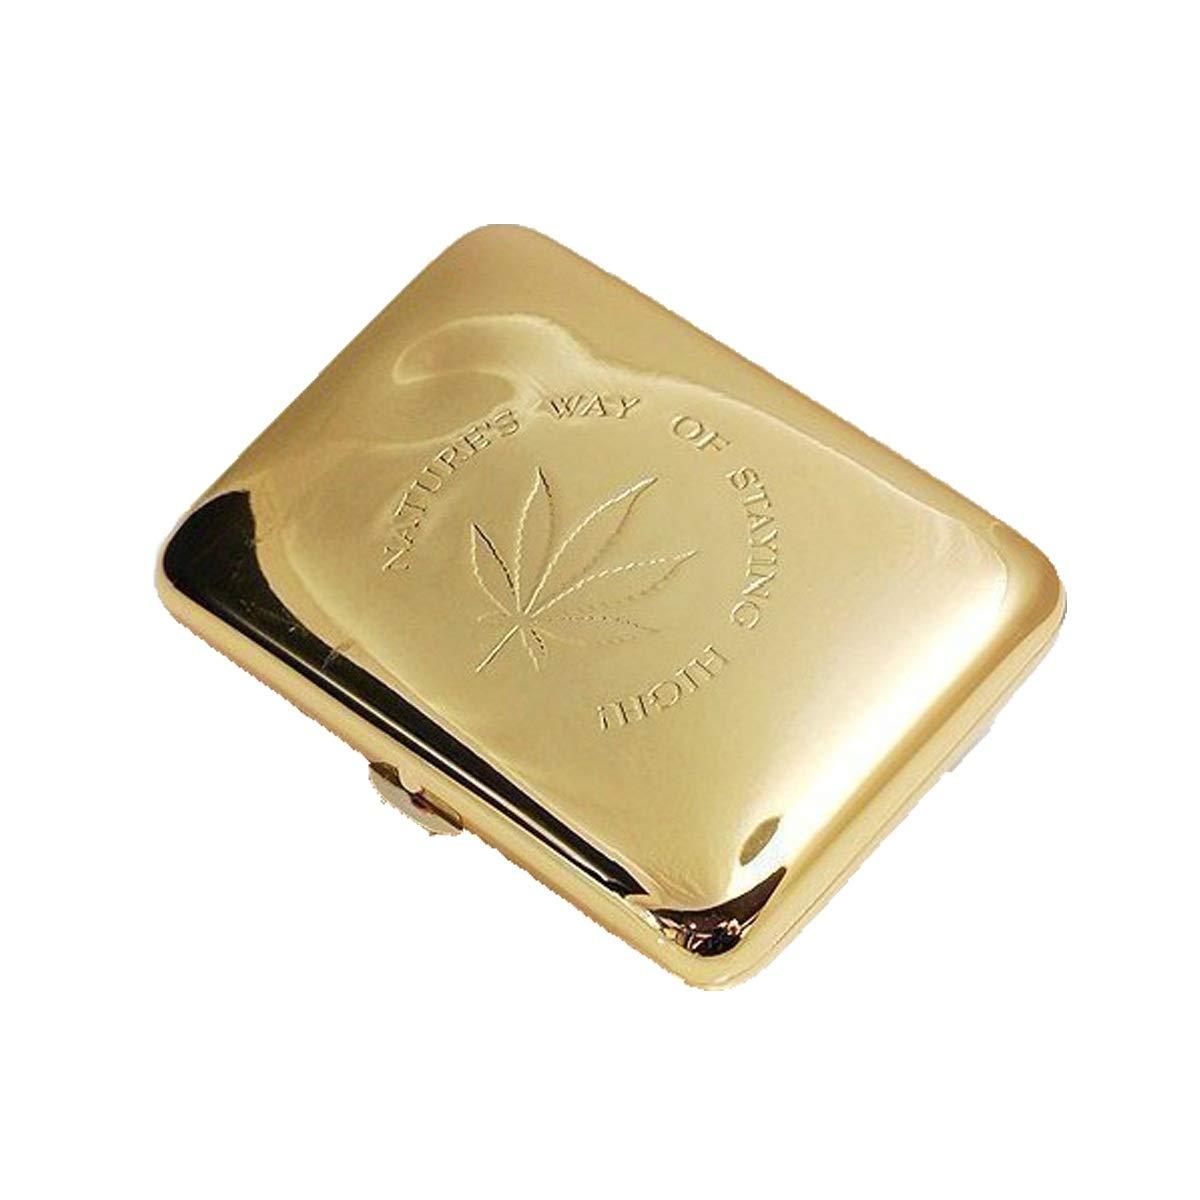 ZHONGYUE Cigarette Case, Portable Cigarette Case, Personalized Cigarette Box, Send Father Birthday Gift Unique Design, Sturdy and Lightweight. (Color : Yellow)